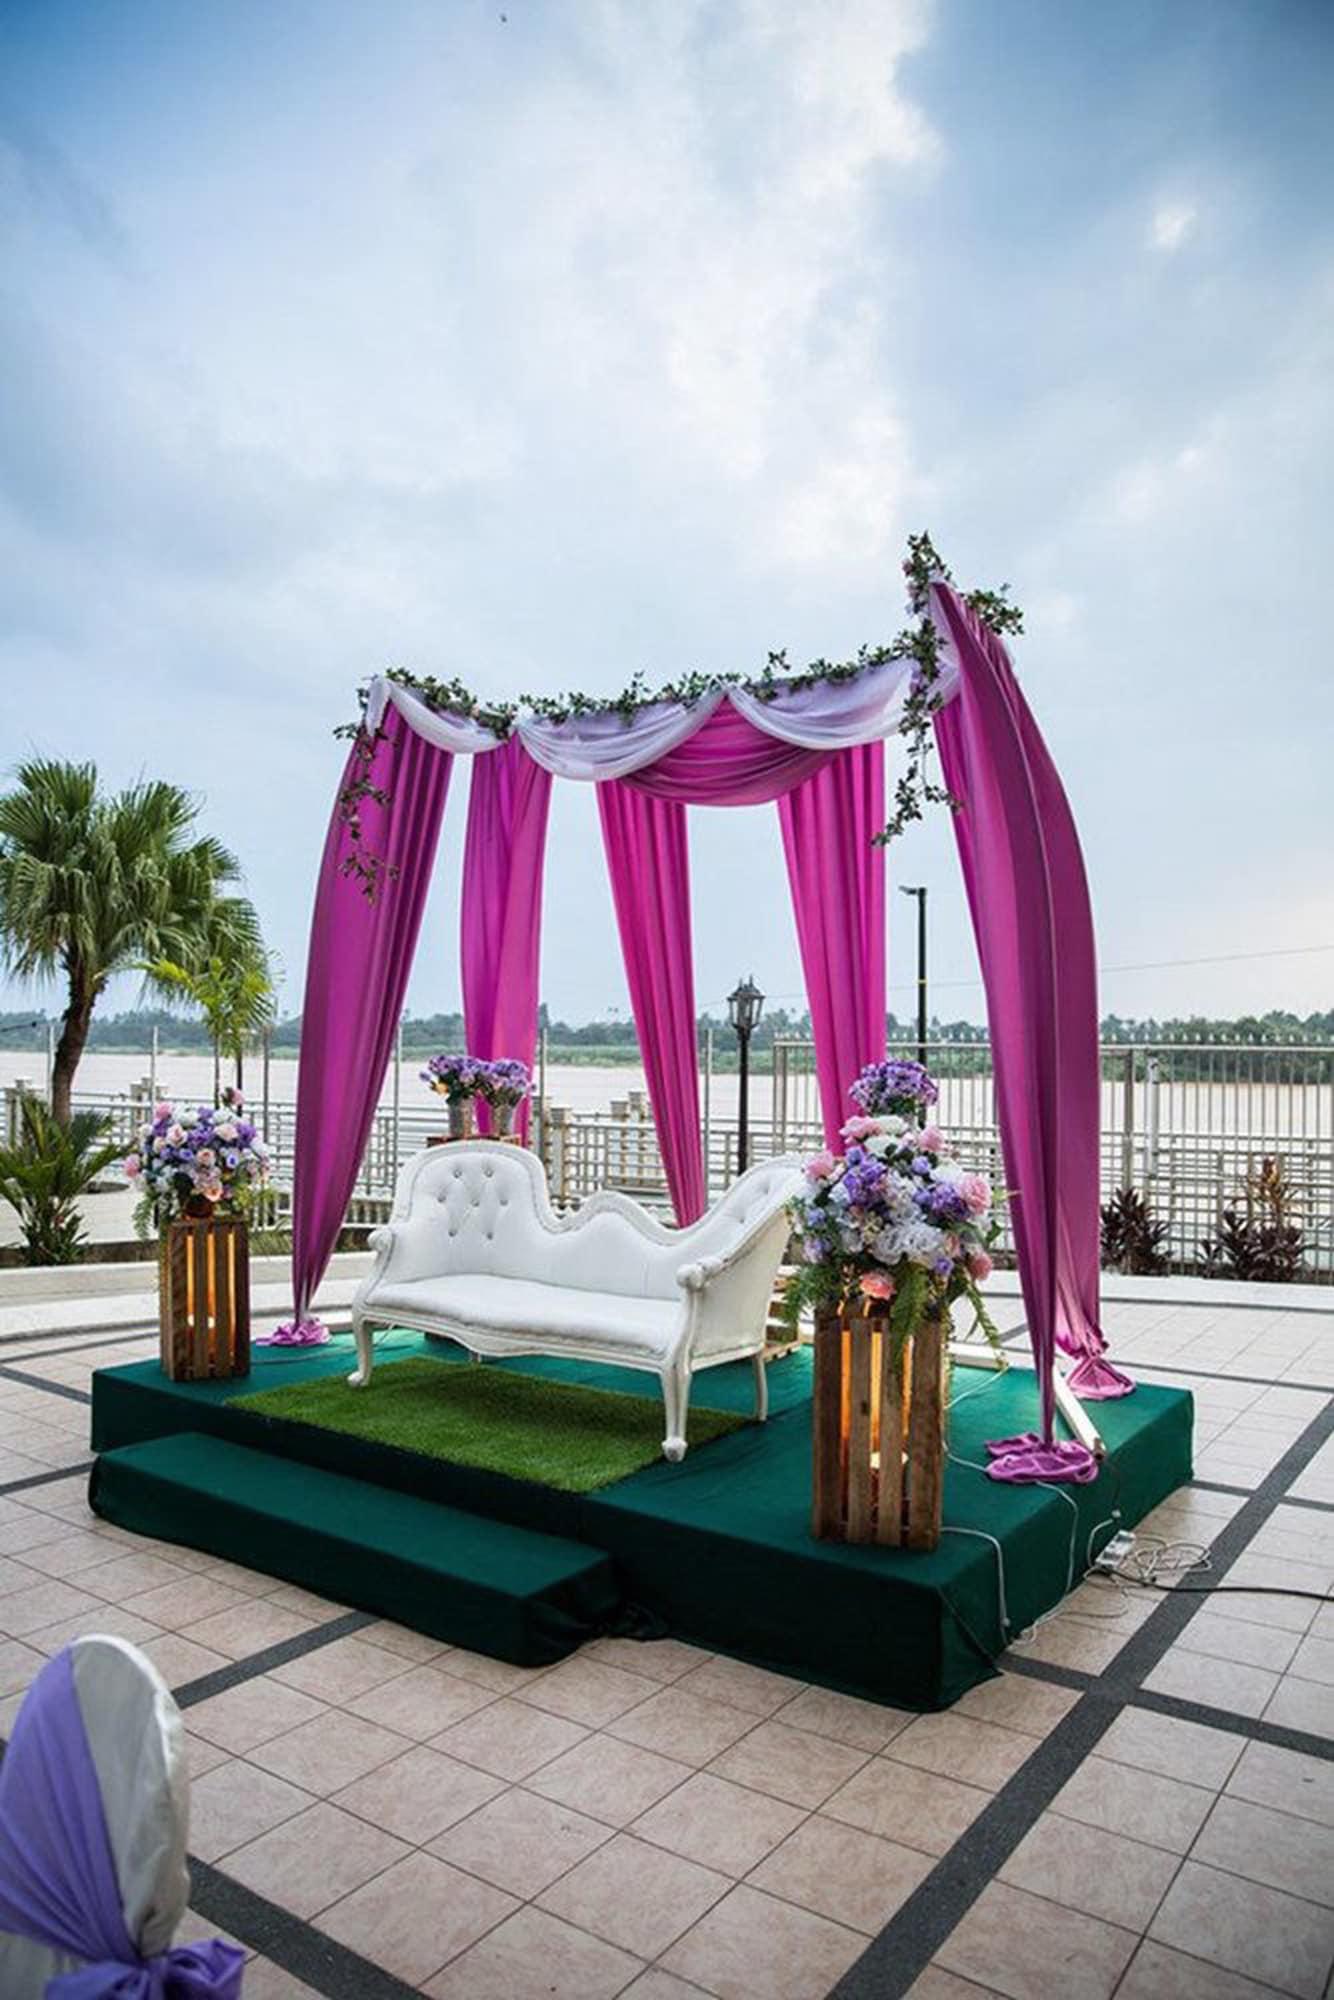 Grand Riverview Hotel, Kota Bharu